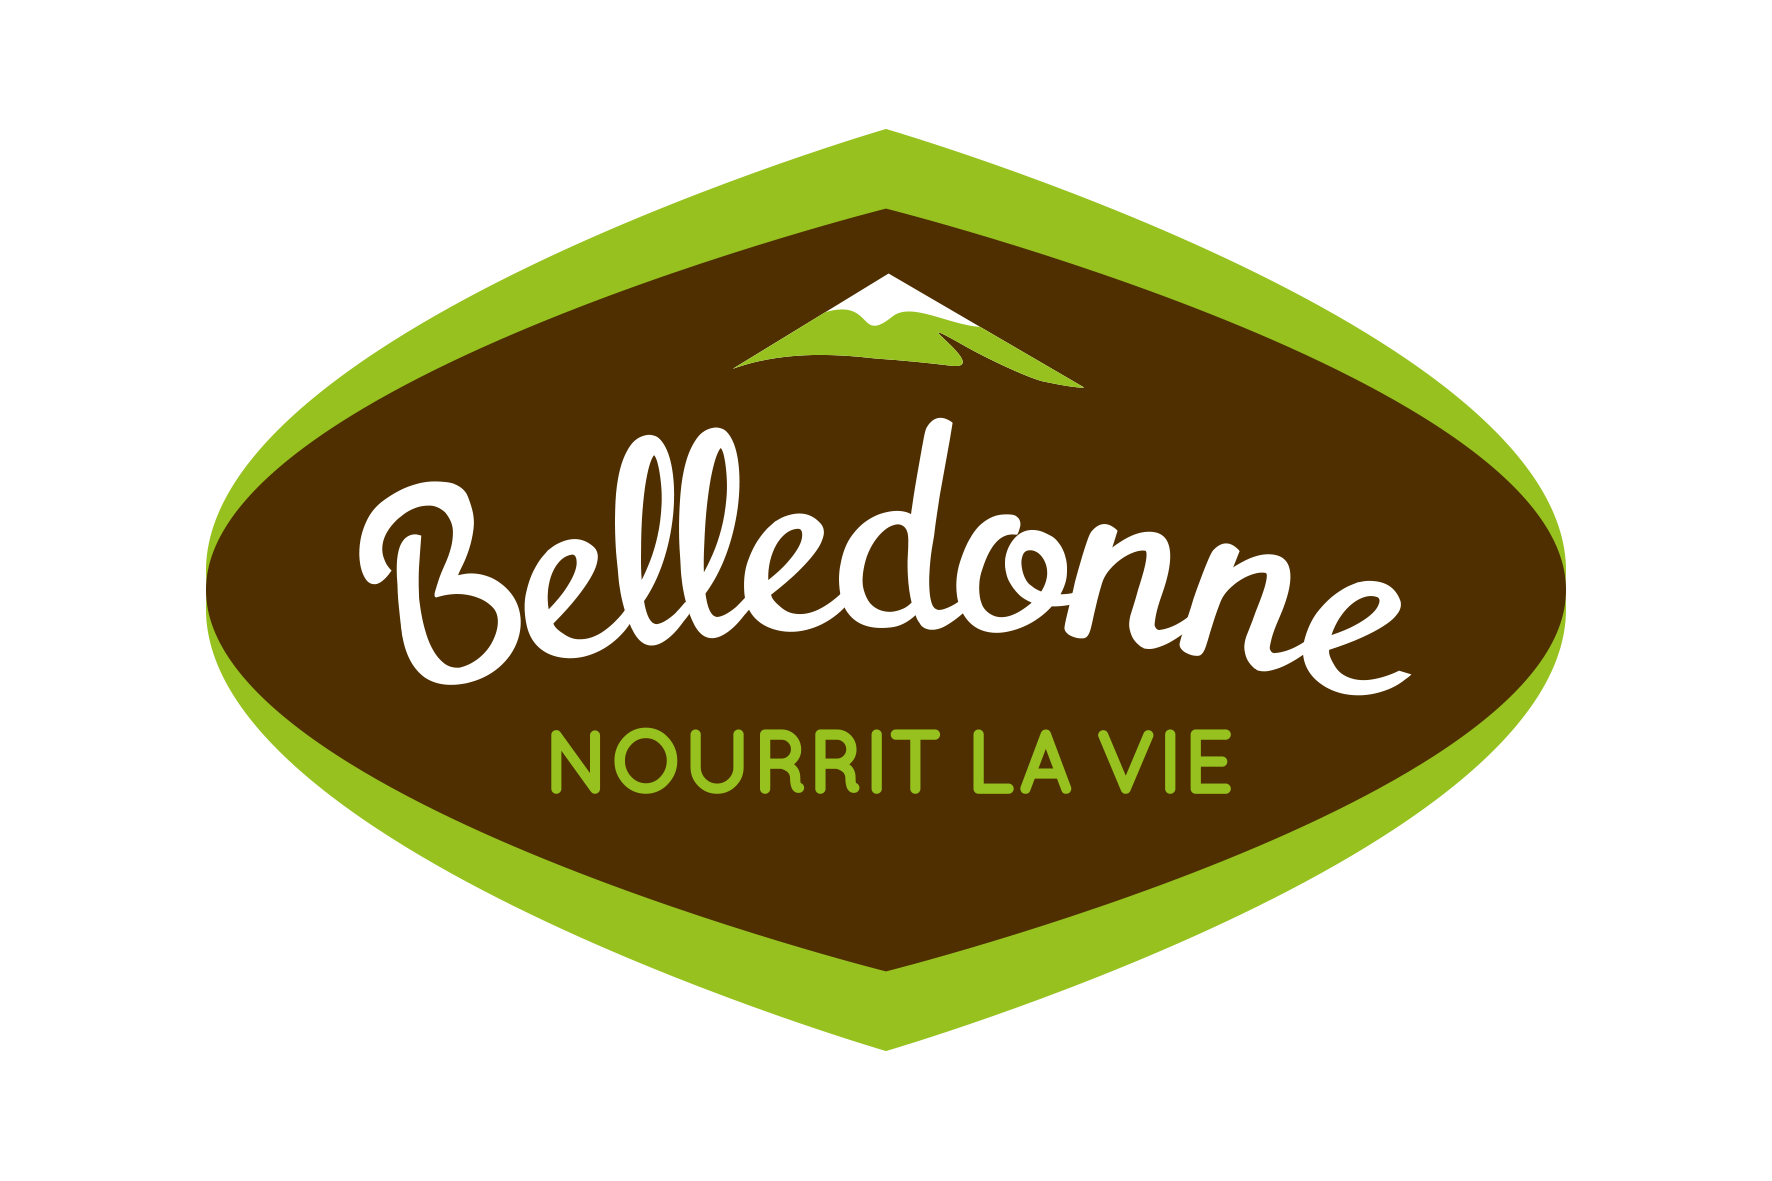 Belledonne logo